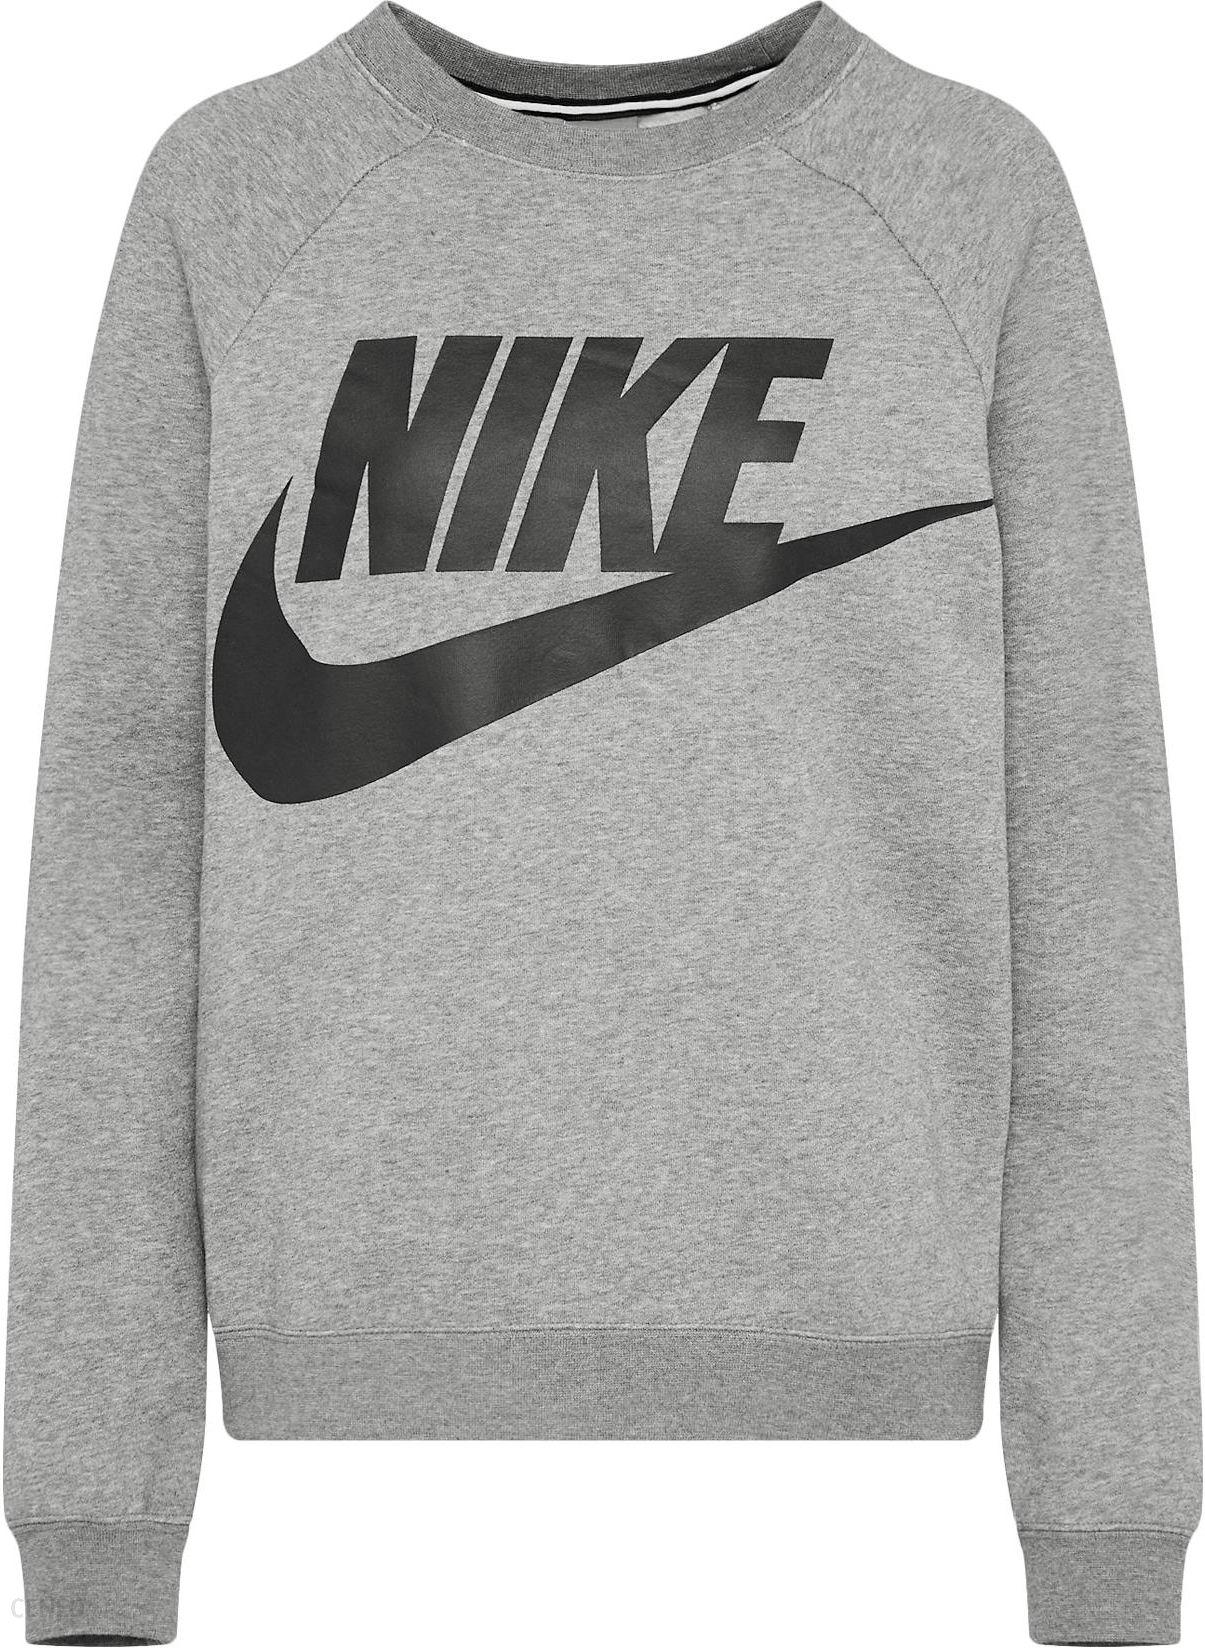 013907b0d77fed Nike Sportswear Bluzka sportowa 'RALLY' Nakrapiany Szary - Ceny i ...